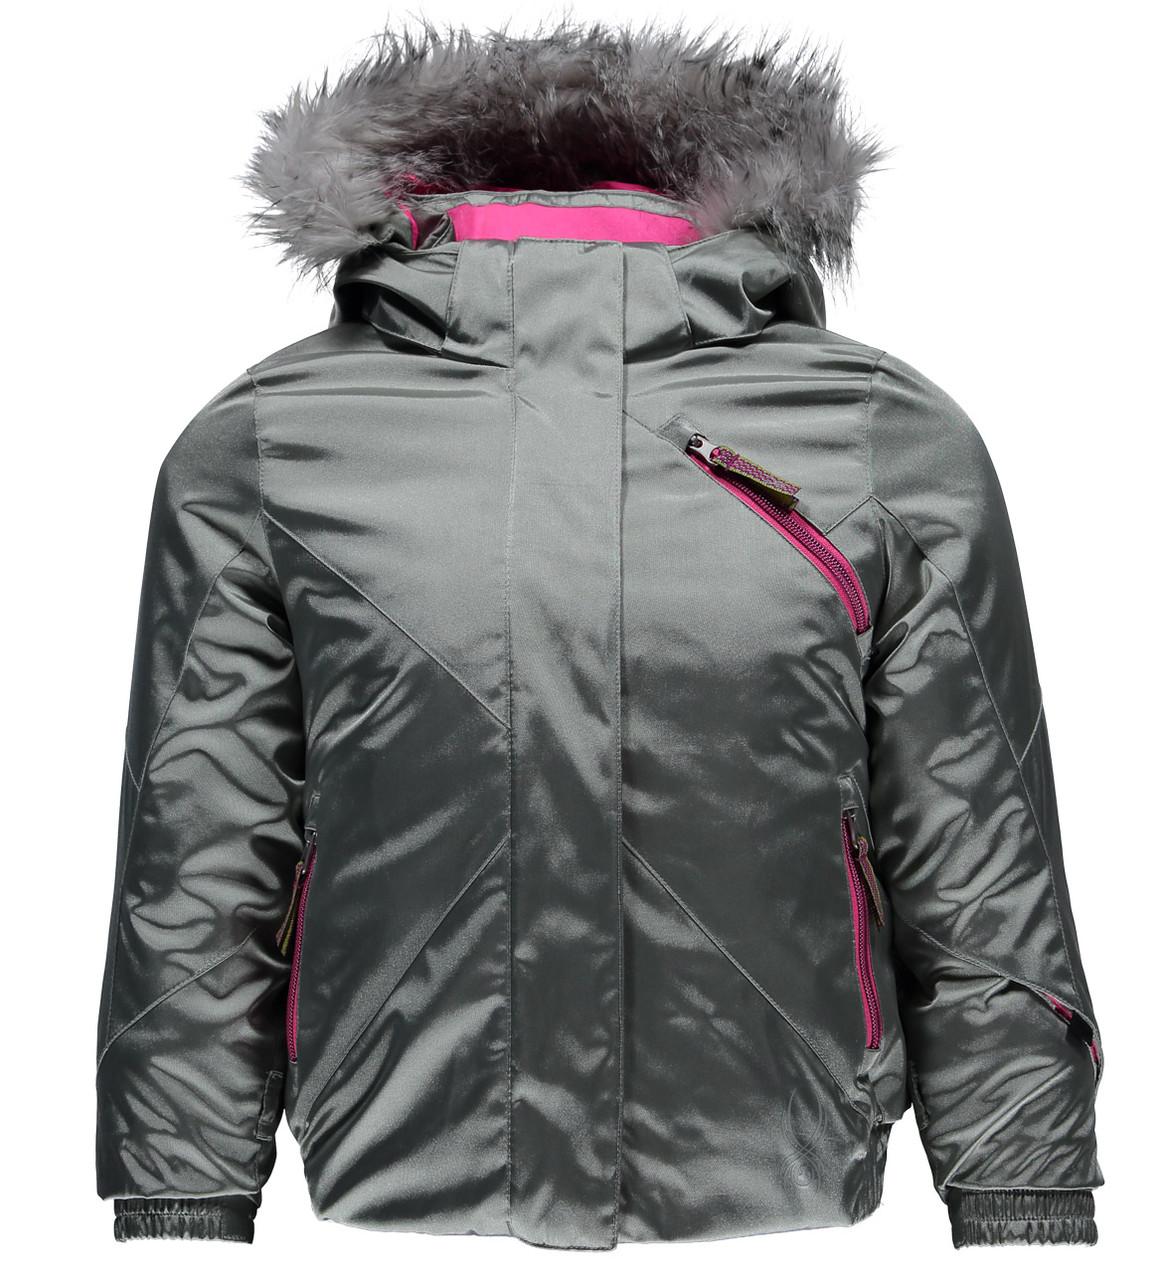 Горнолыжная куртка Spyder Bitsy lola silver/bryte bubblegum (MD)